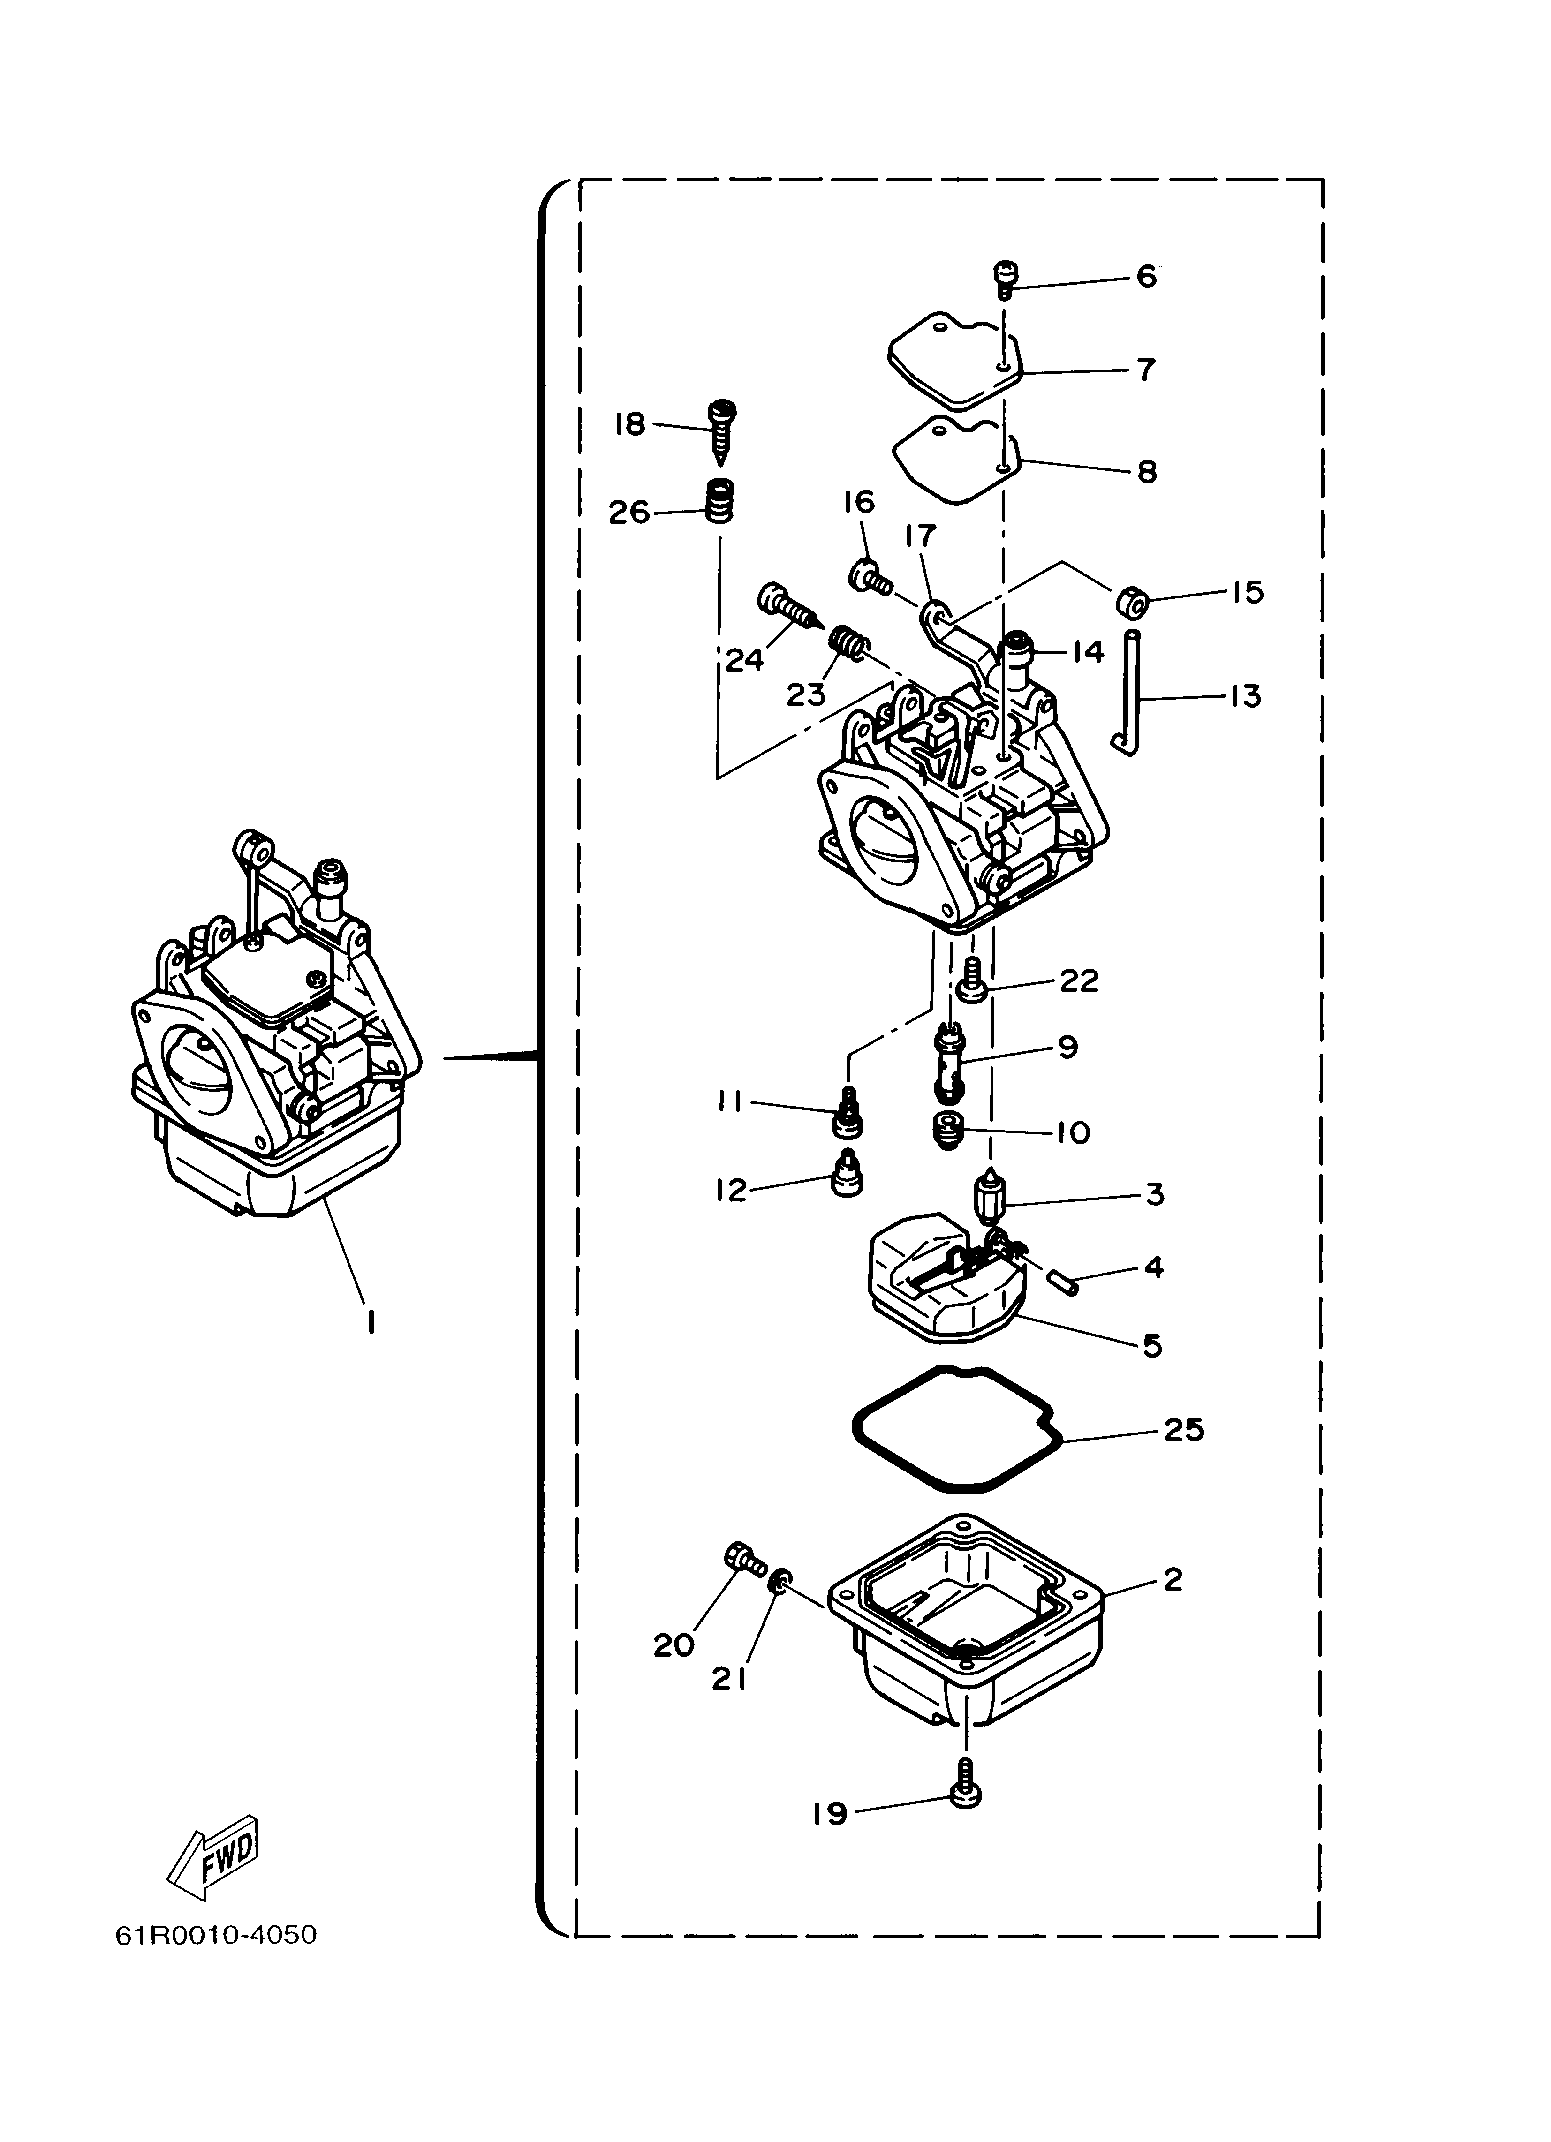 1997 dodge dakota tach wiring diagram 2003 gmc yukon denali radio tohatsu outboard best library mercury 110 9 8 hp 25